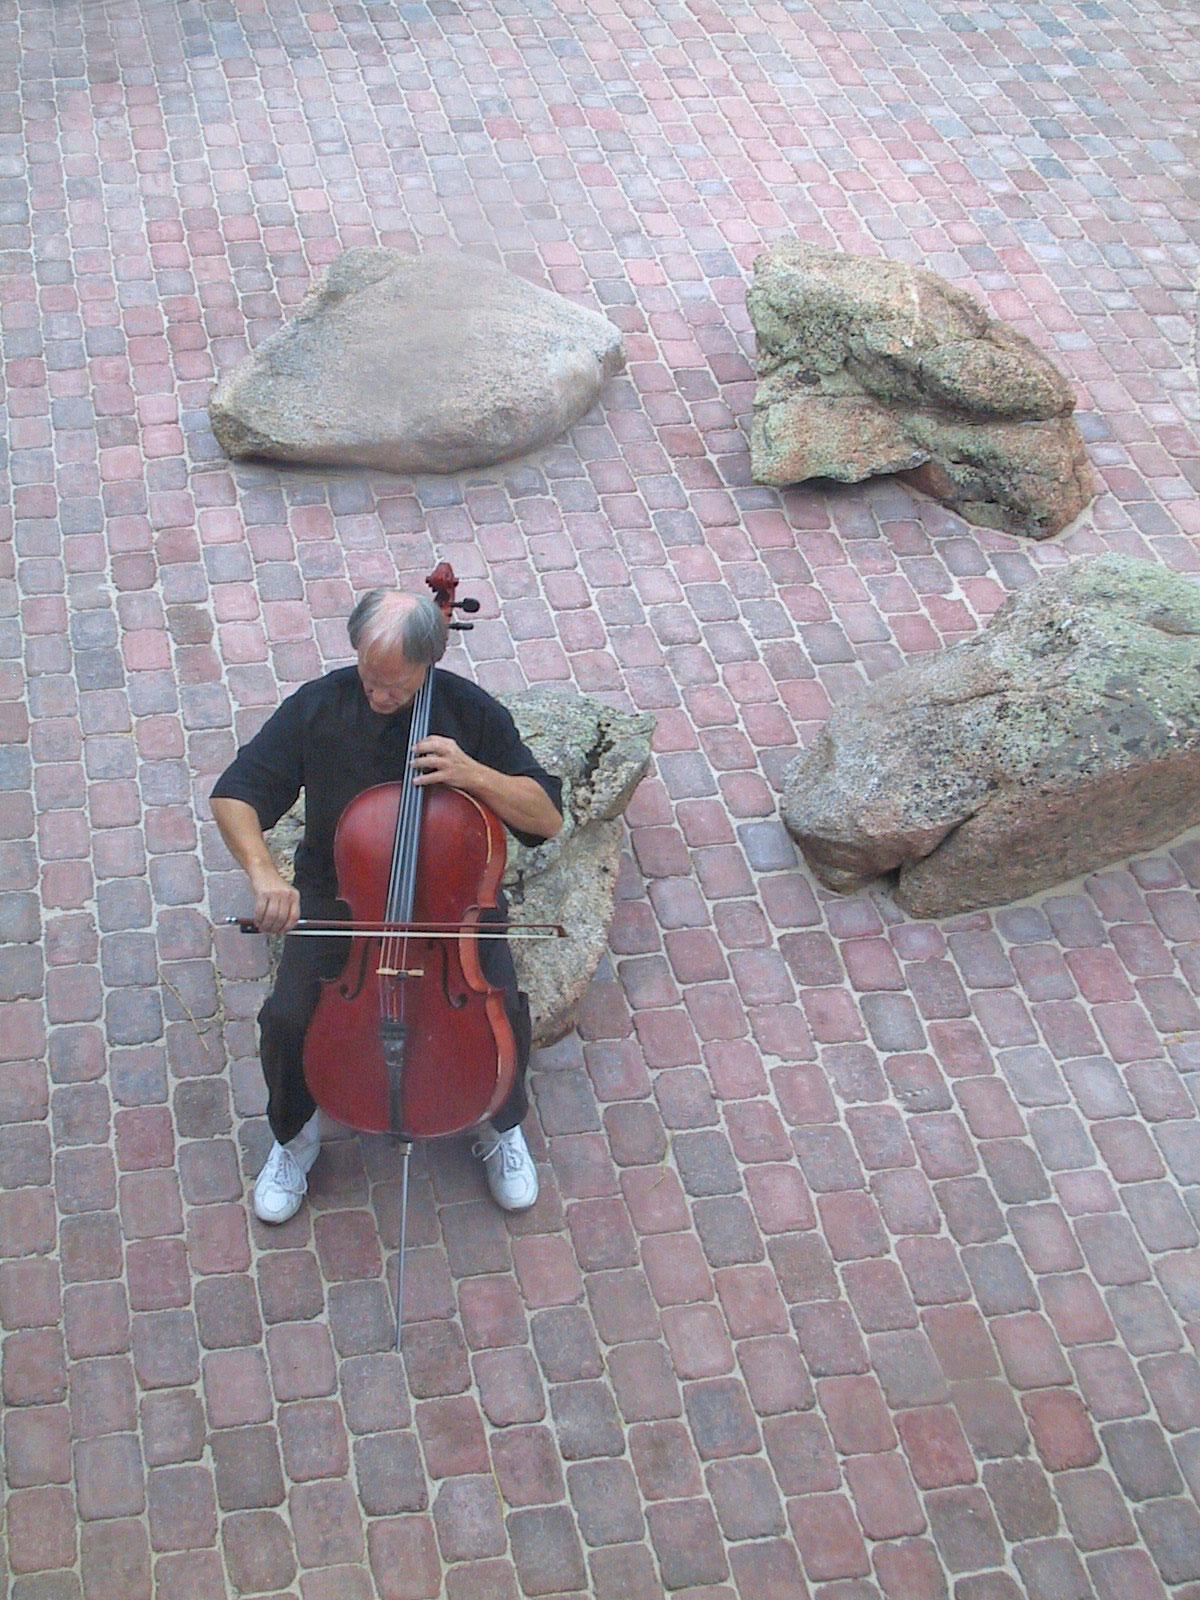 david-on-one-of-four-rocks-OP.jpg